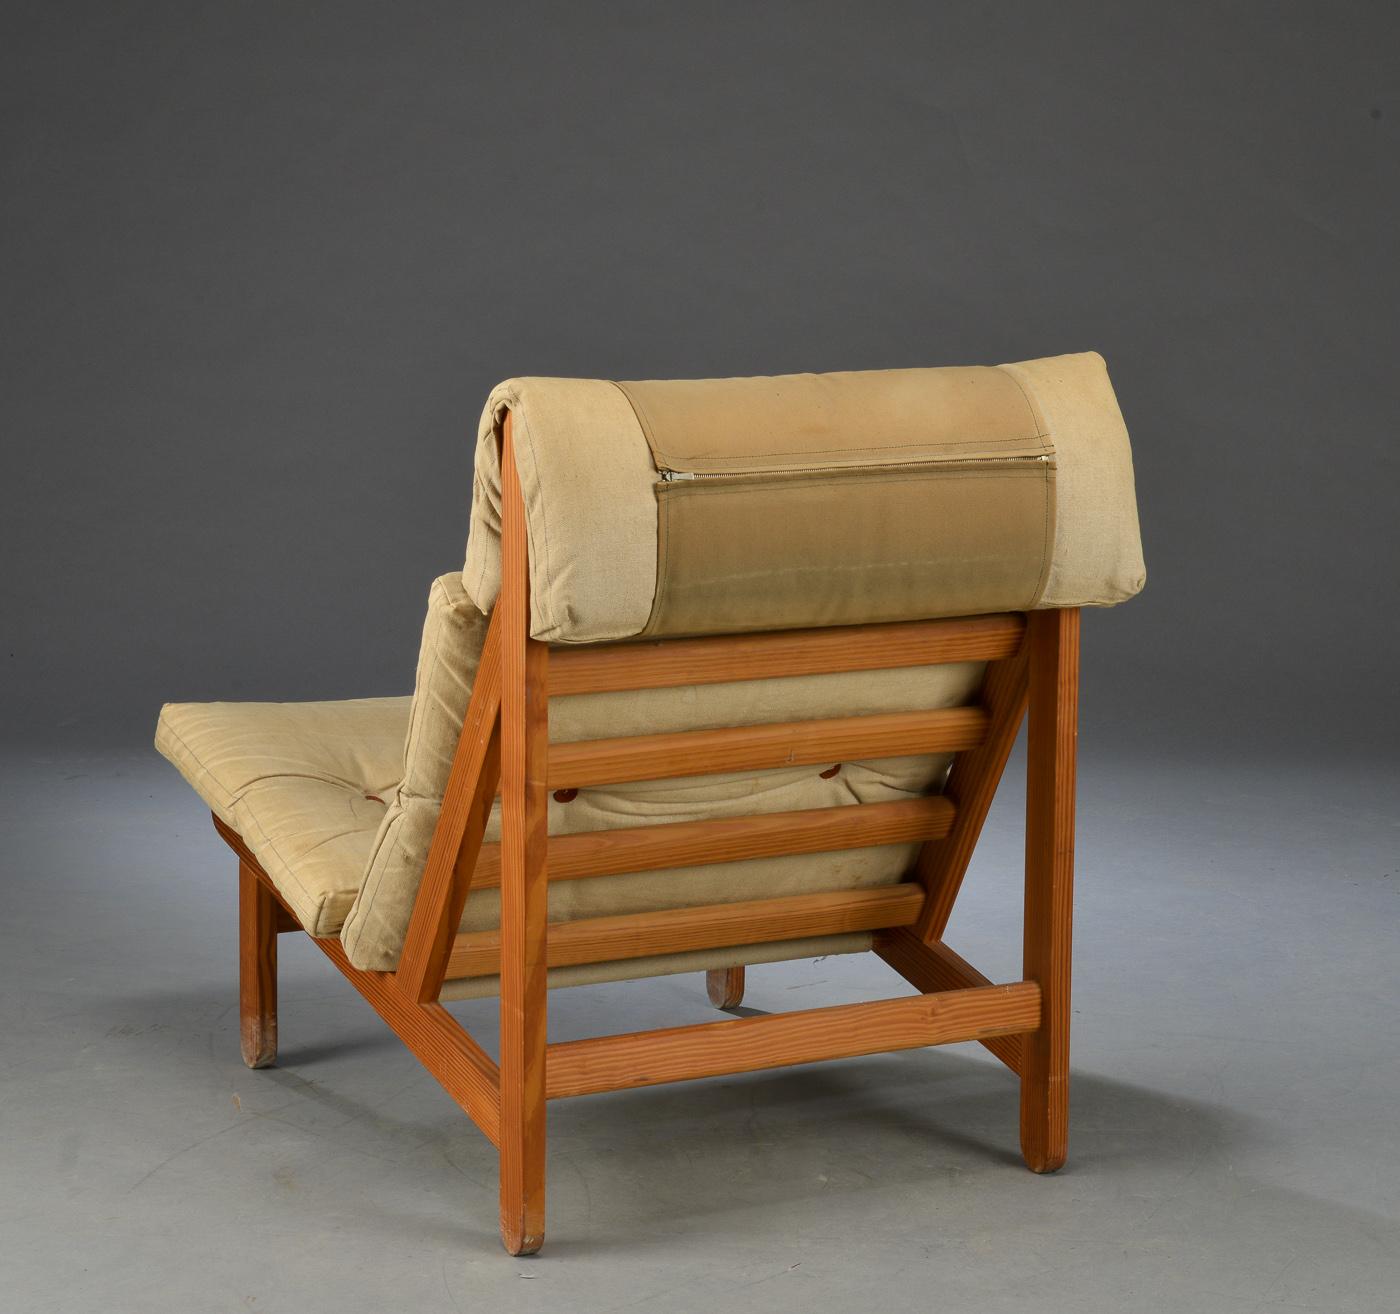 Bernt Pedersen. Kludestol The Rag Chair samt skammel